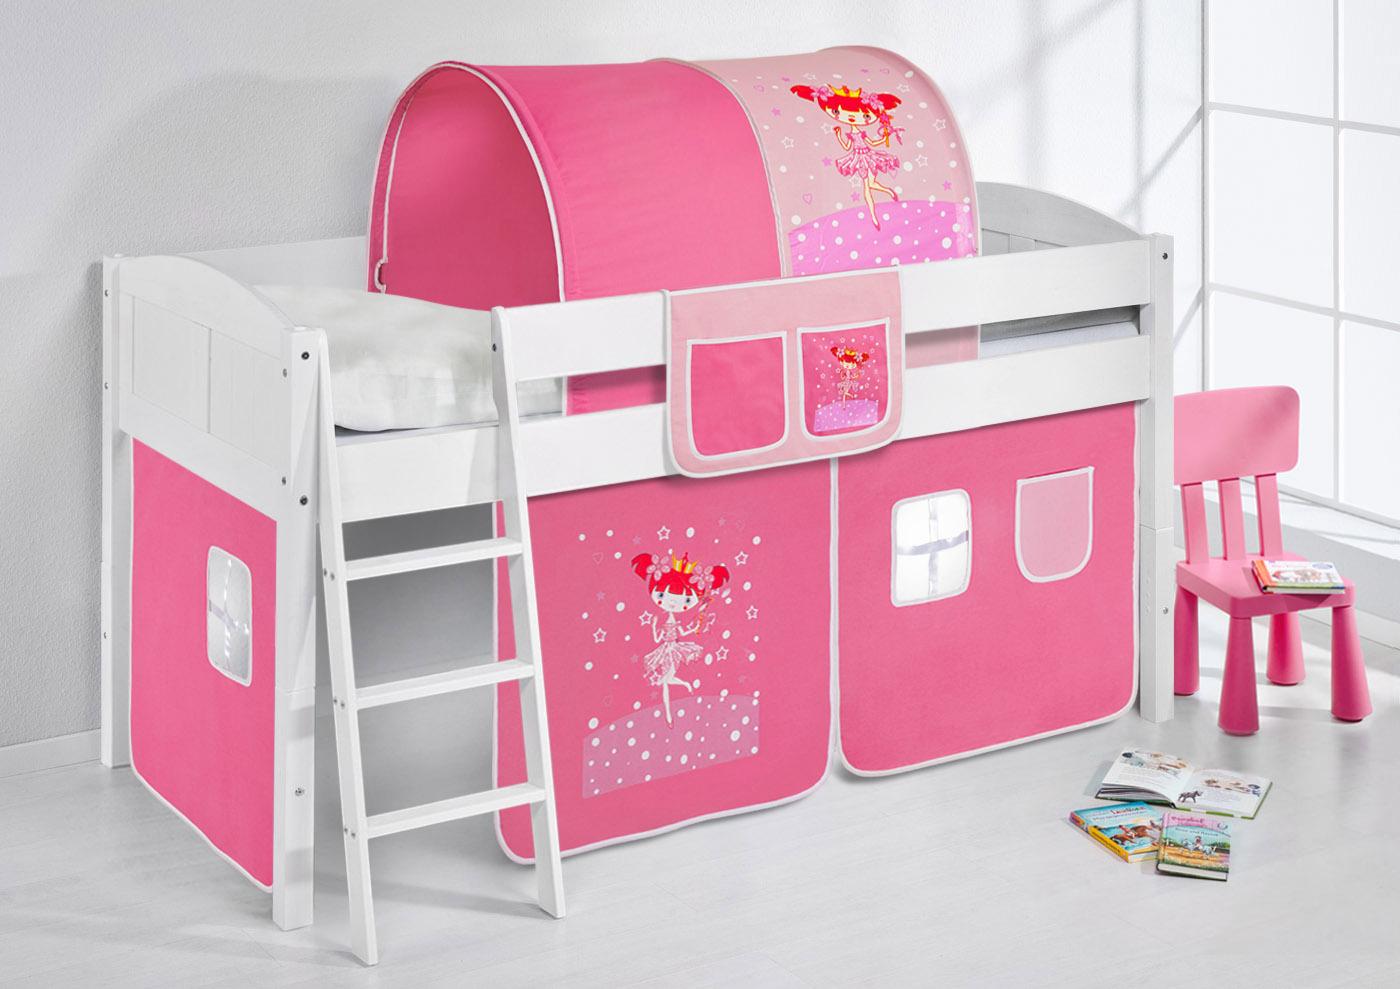 einzelbett f r kinder. Black Bedroom Furniture Sets. Home Design Ideas